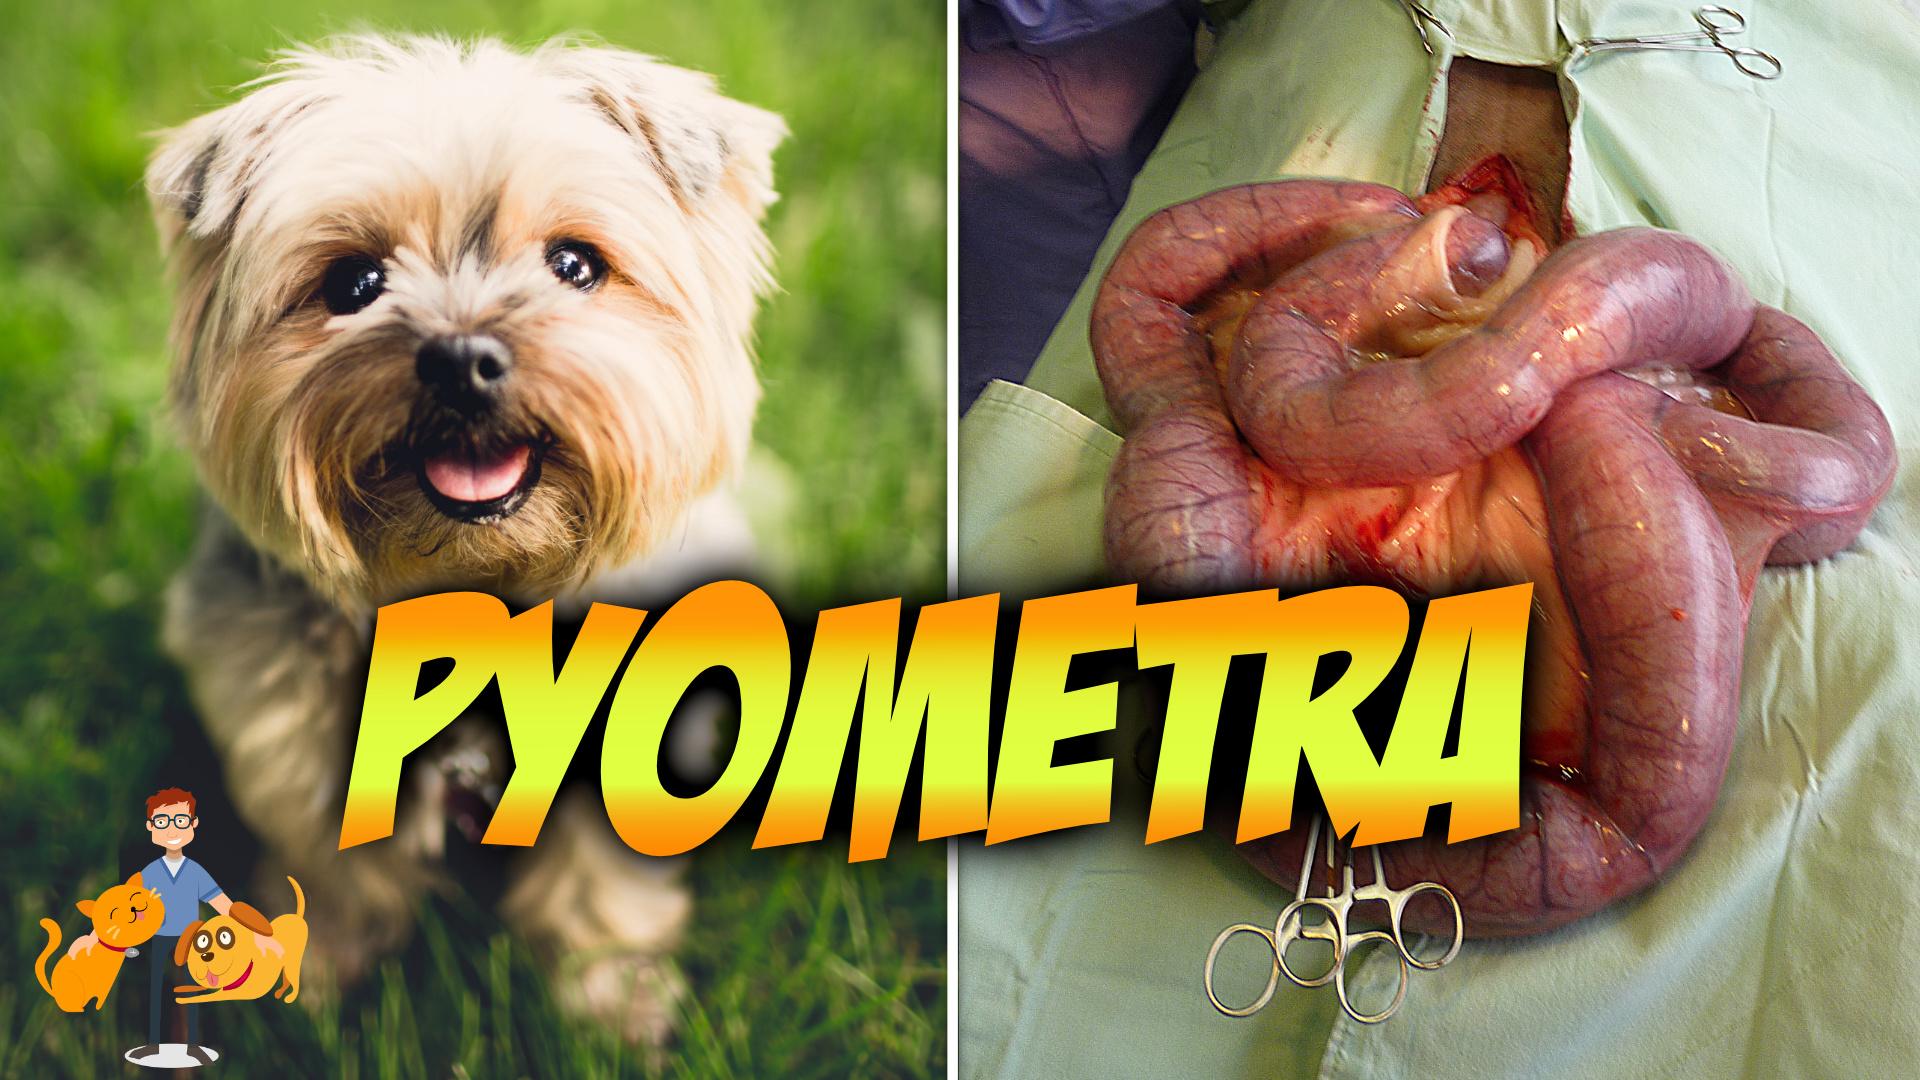 pyometra, a true dog emergency